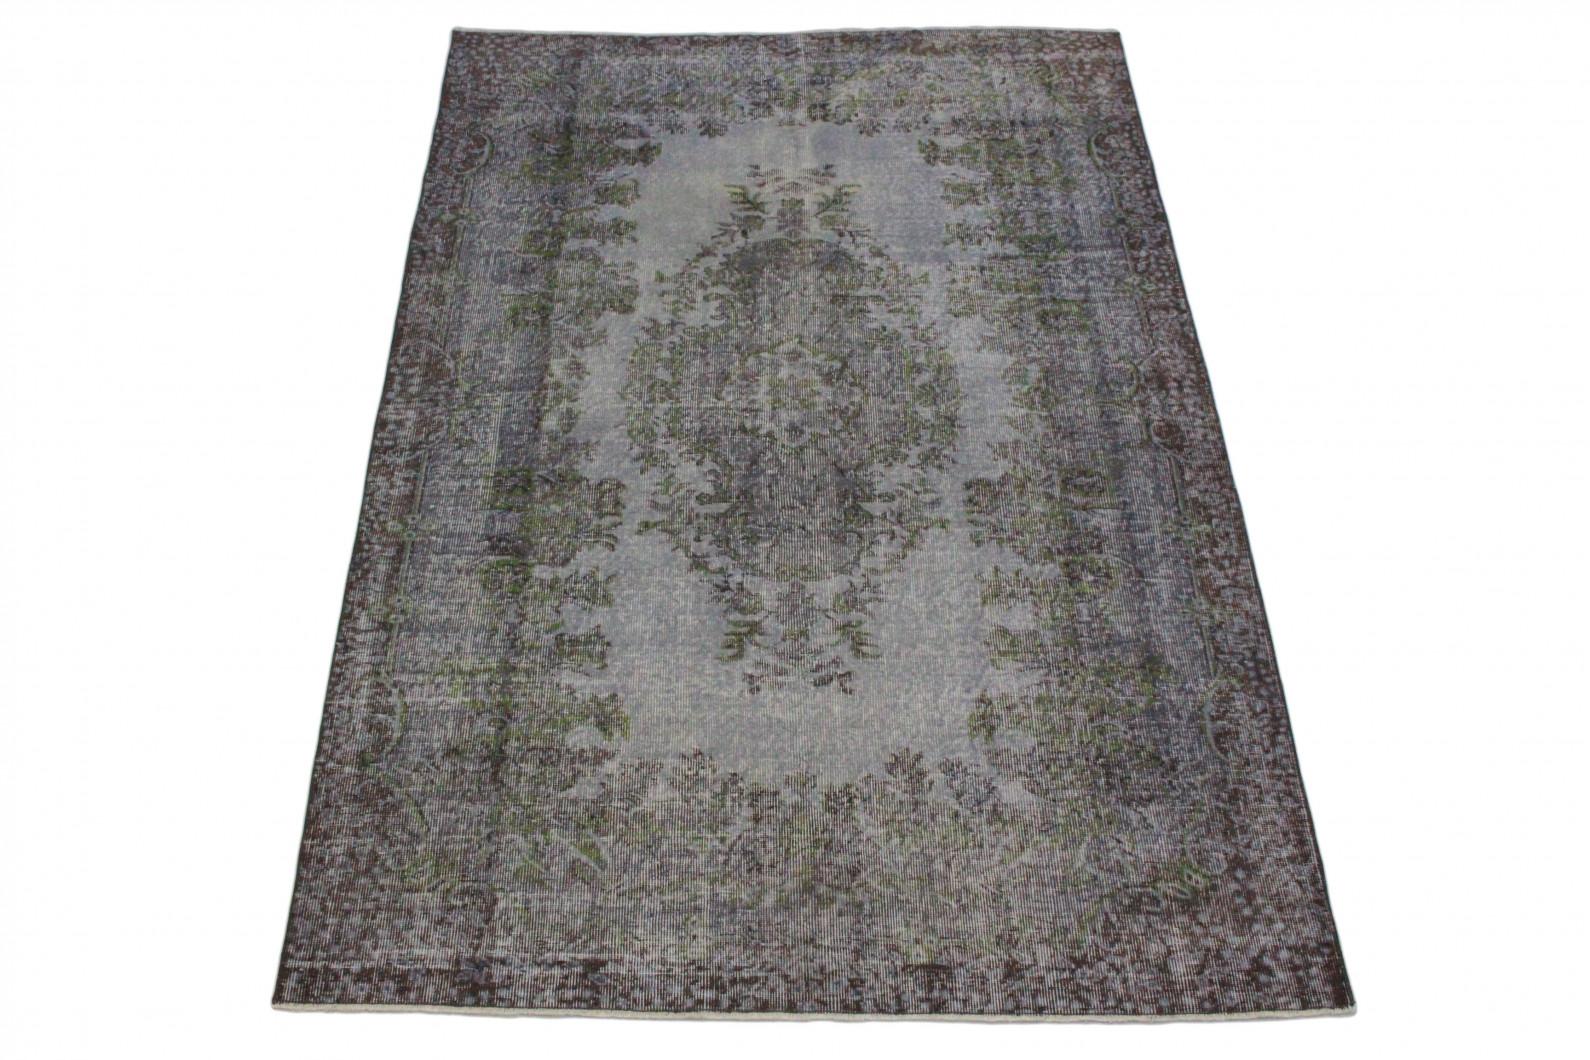 vintage teppich grau in 260x170 1011 5162 bei carpetido. Black Bedroom Furniture Sets. Home Design Ideas